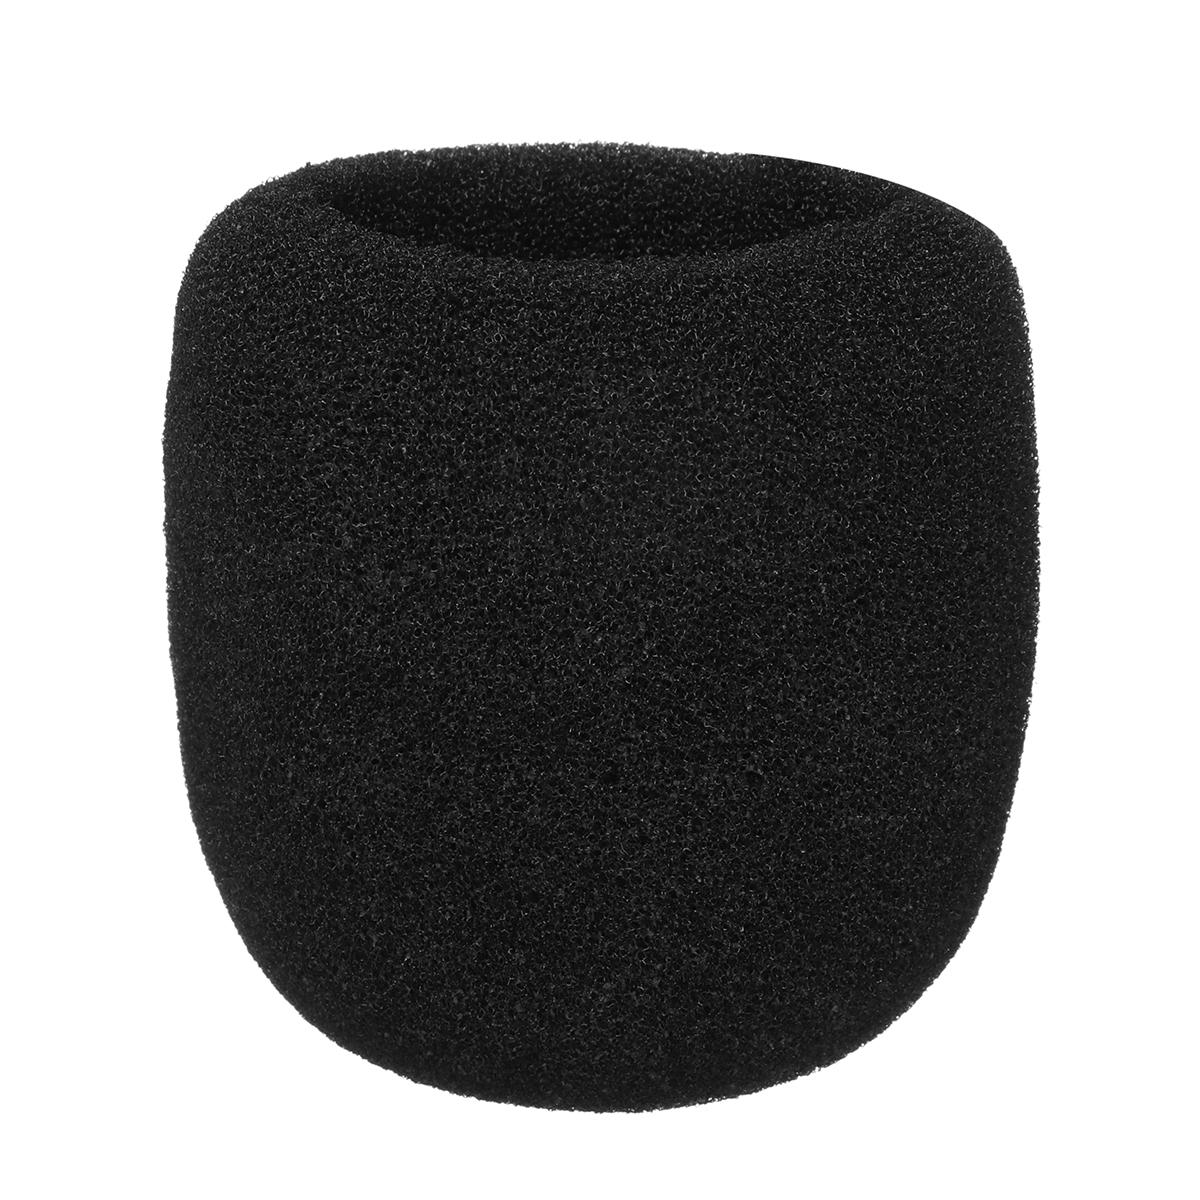 Foam Windscreen for Zoom H1 Handy Portable Digital Recorder By Hermitshell